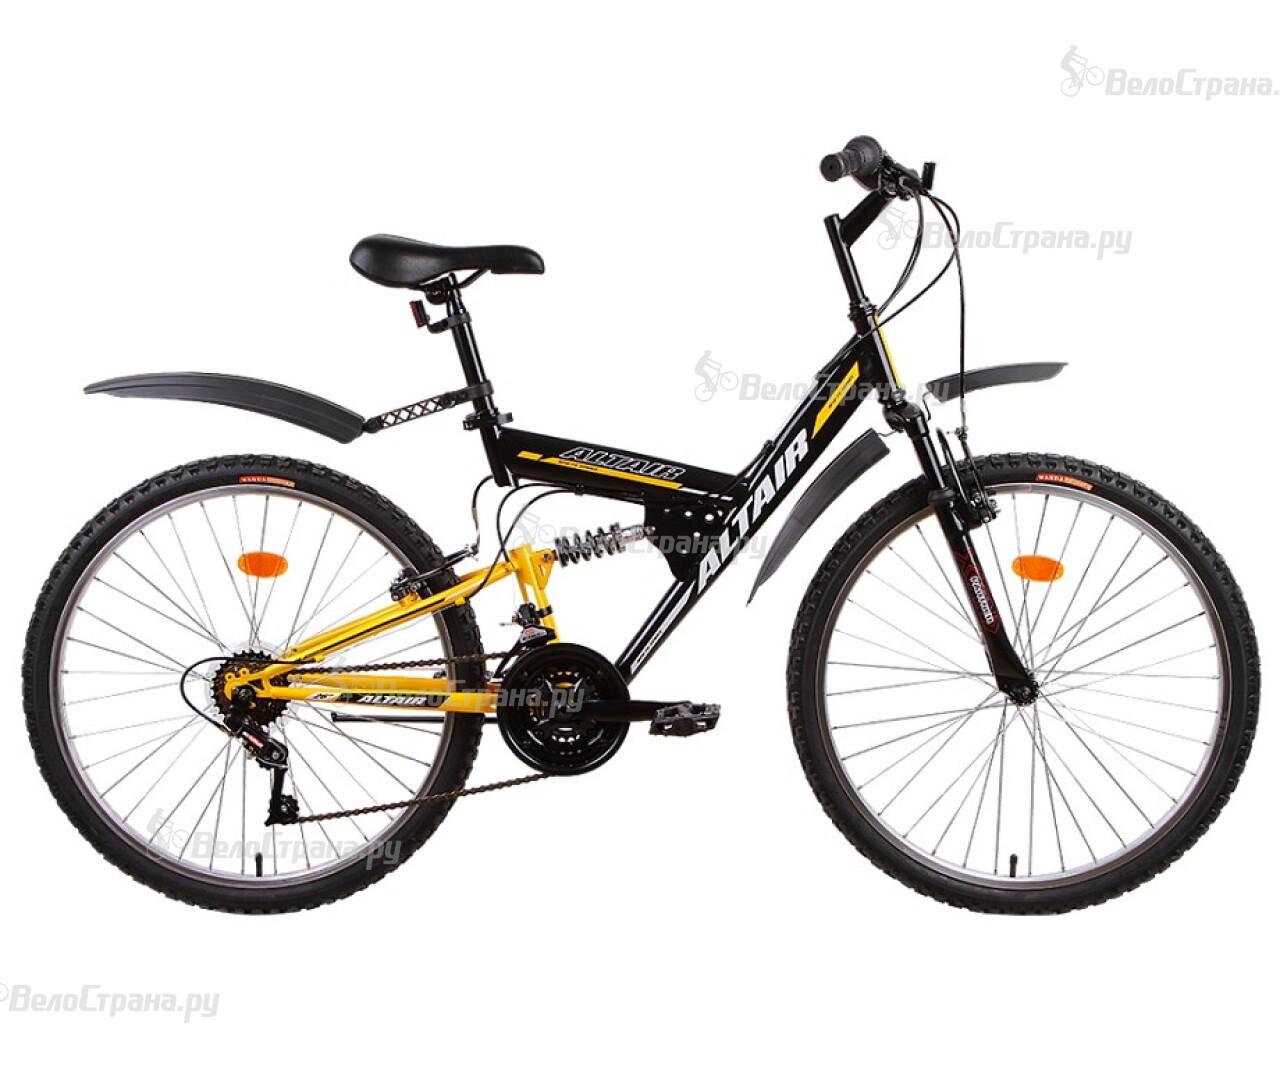 Велосипед Forward Altair MTB FS 26 (2015) велосипед forward altair city girl 20 compact 2015